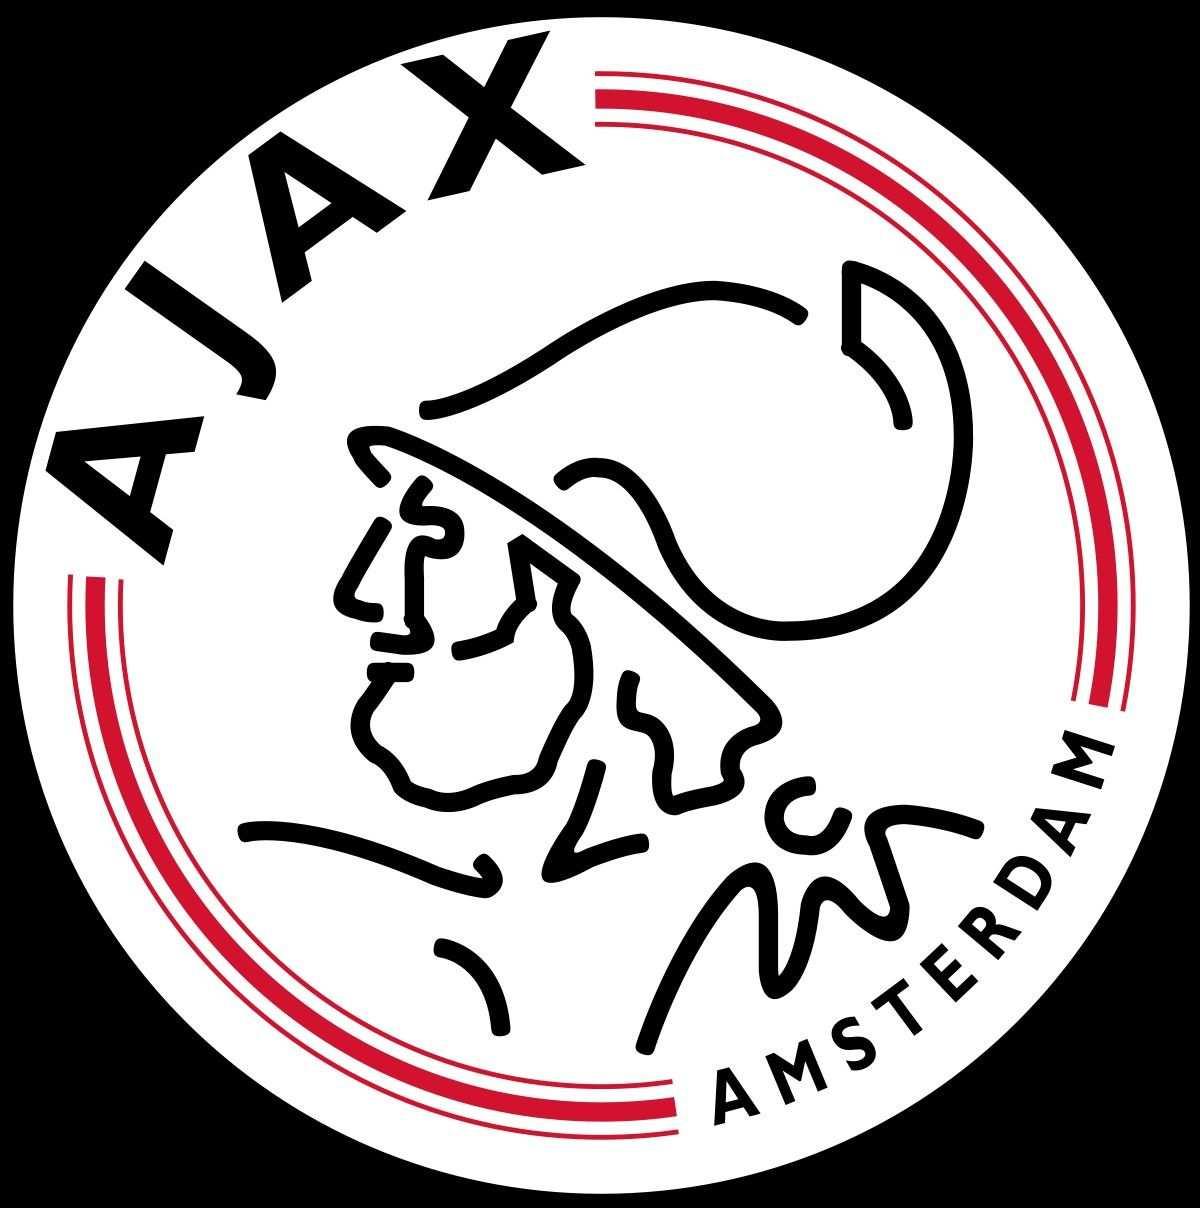 Ajax Logo Kleurplaten Grappige Bureaubladachtergronden Voetbal